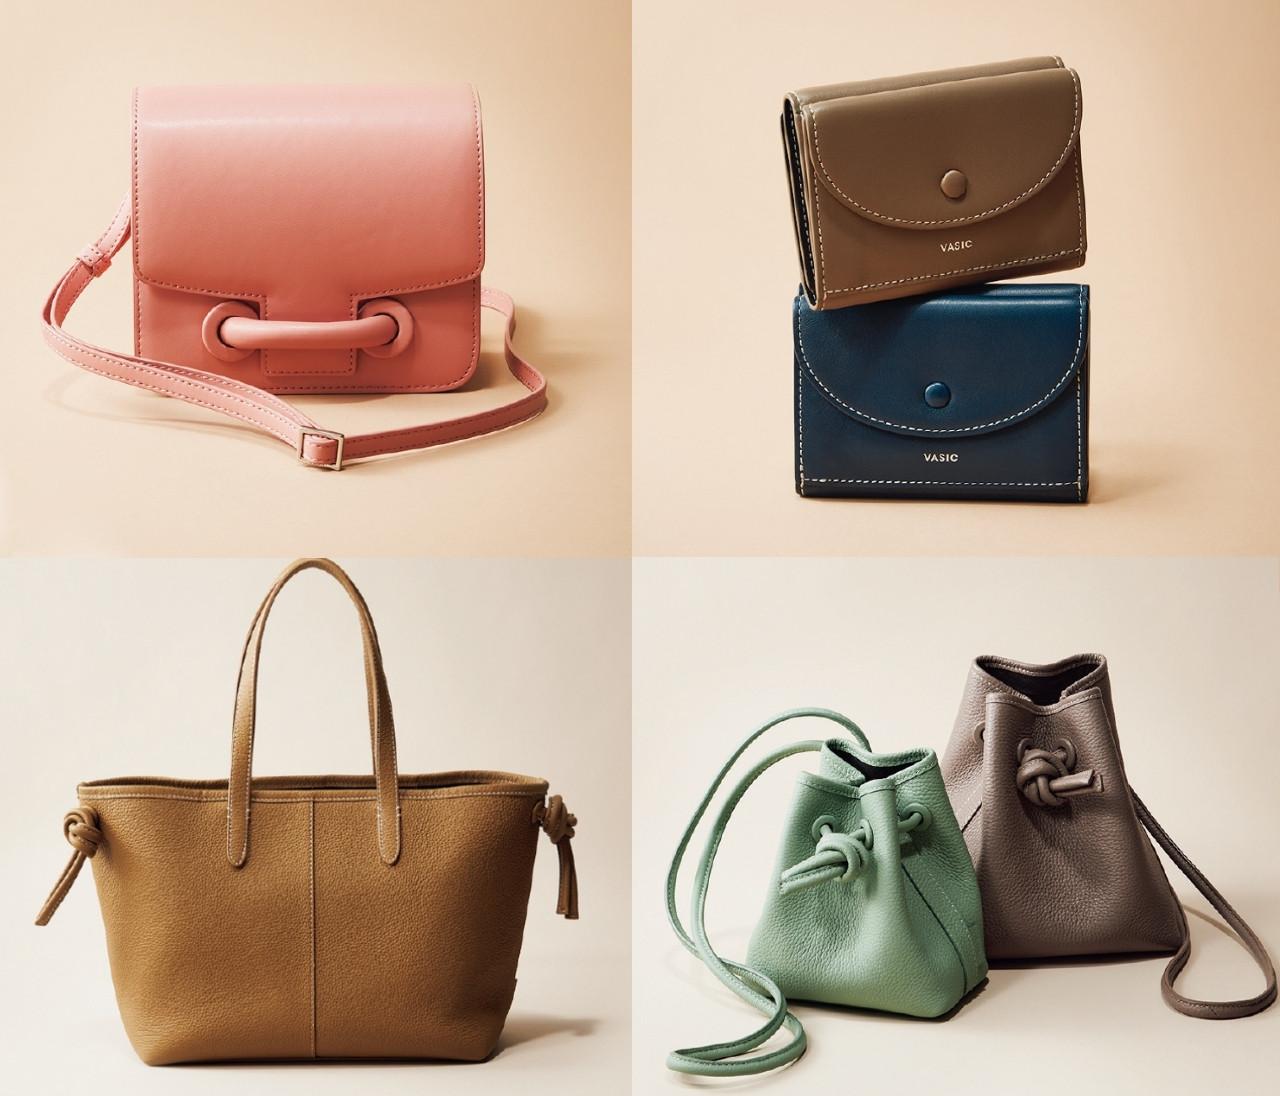 【VASICまとめ】新作と定番バッグのおすすめ&ミニ財布も!